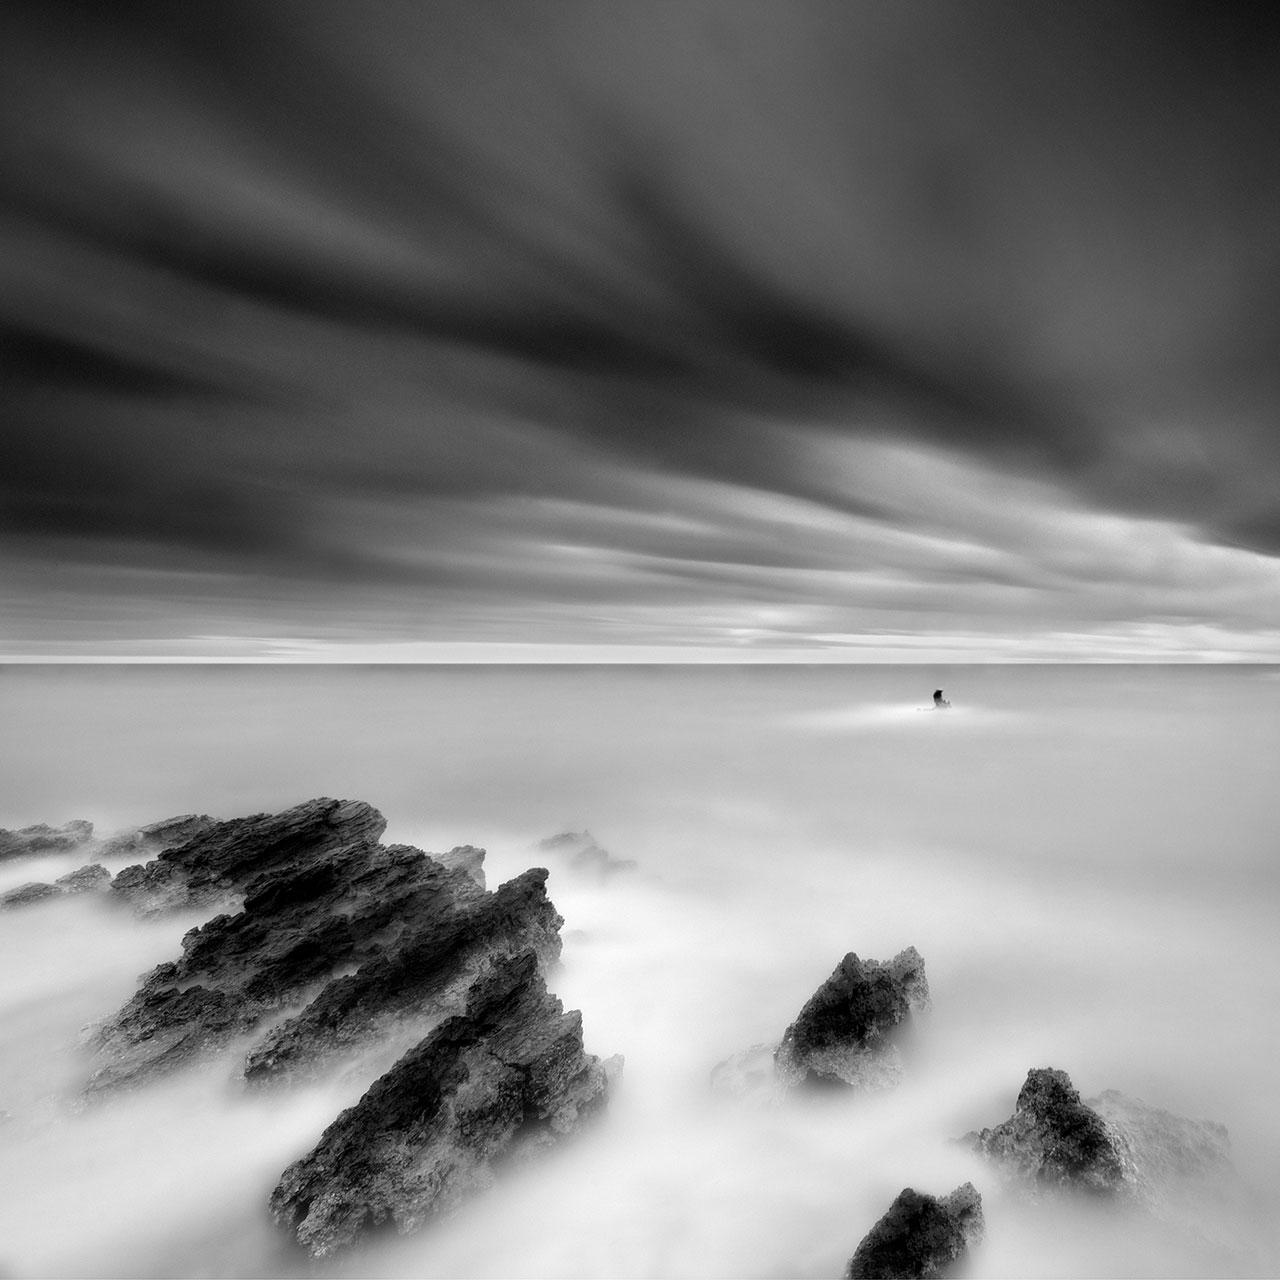 George Digalakis,Like a rolling stone. ©George Digalakis.